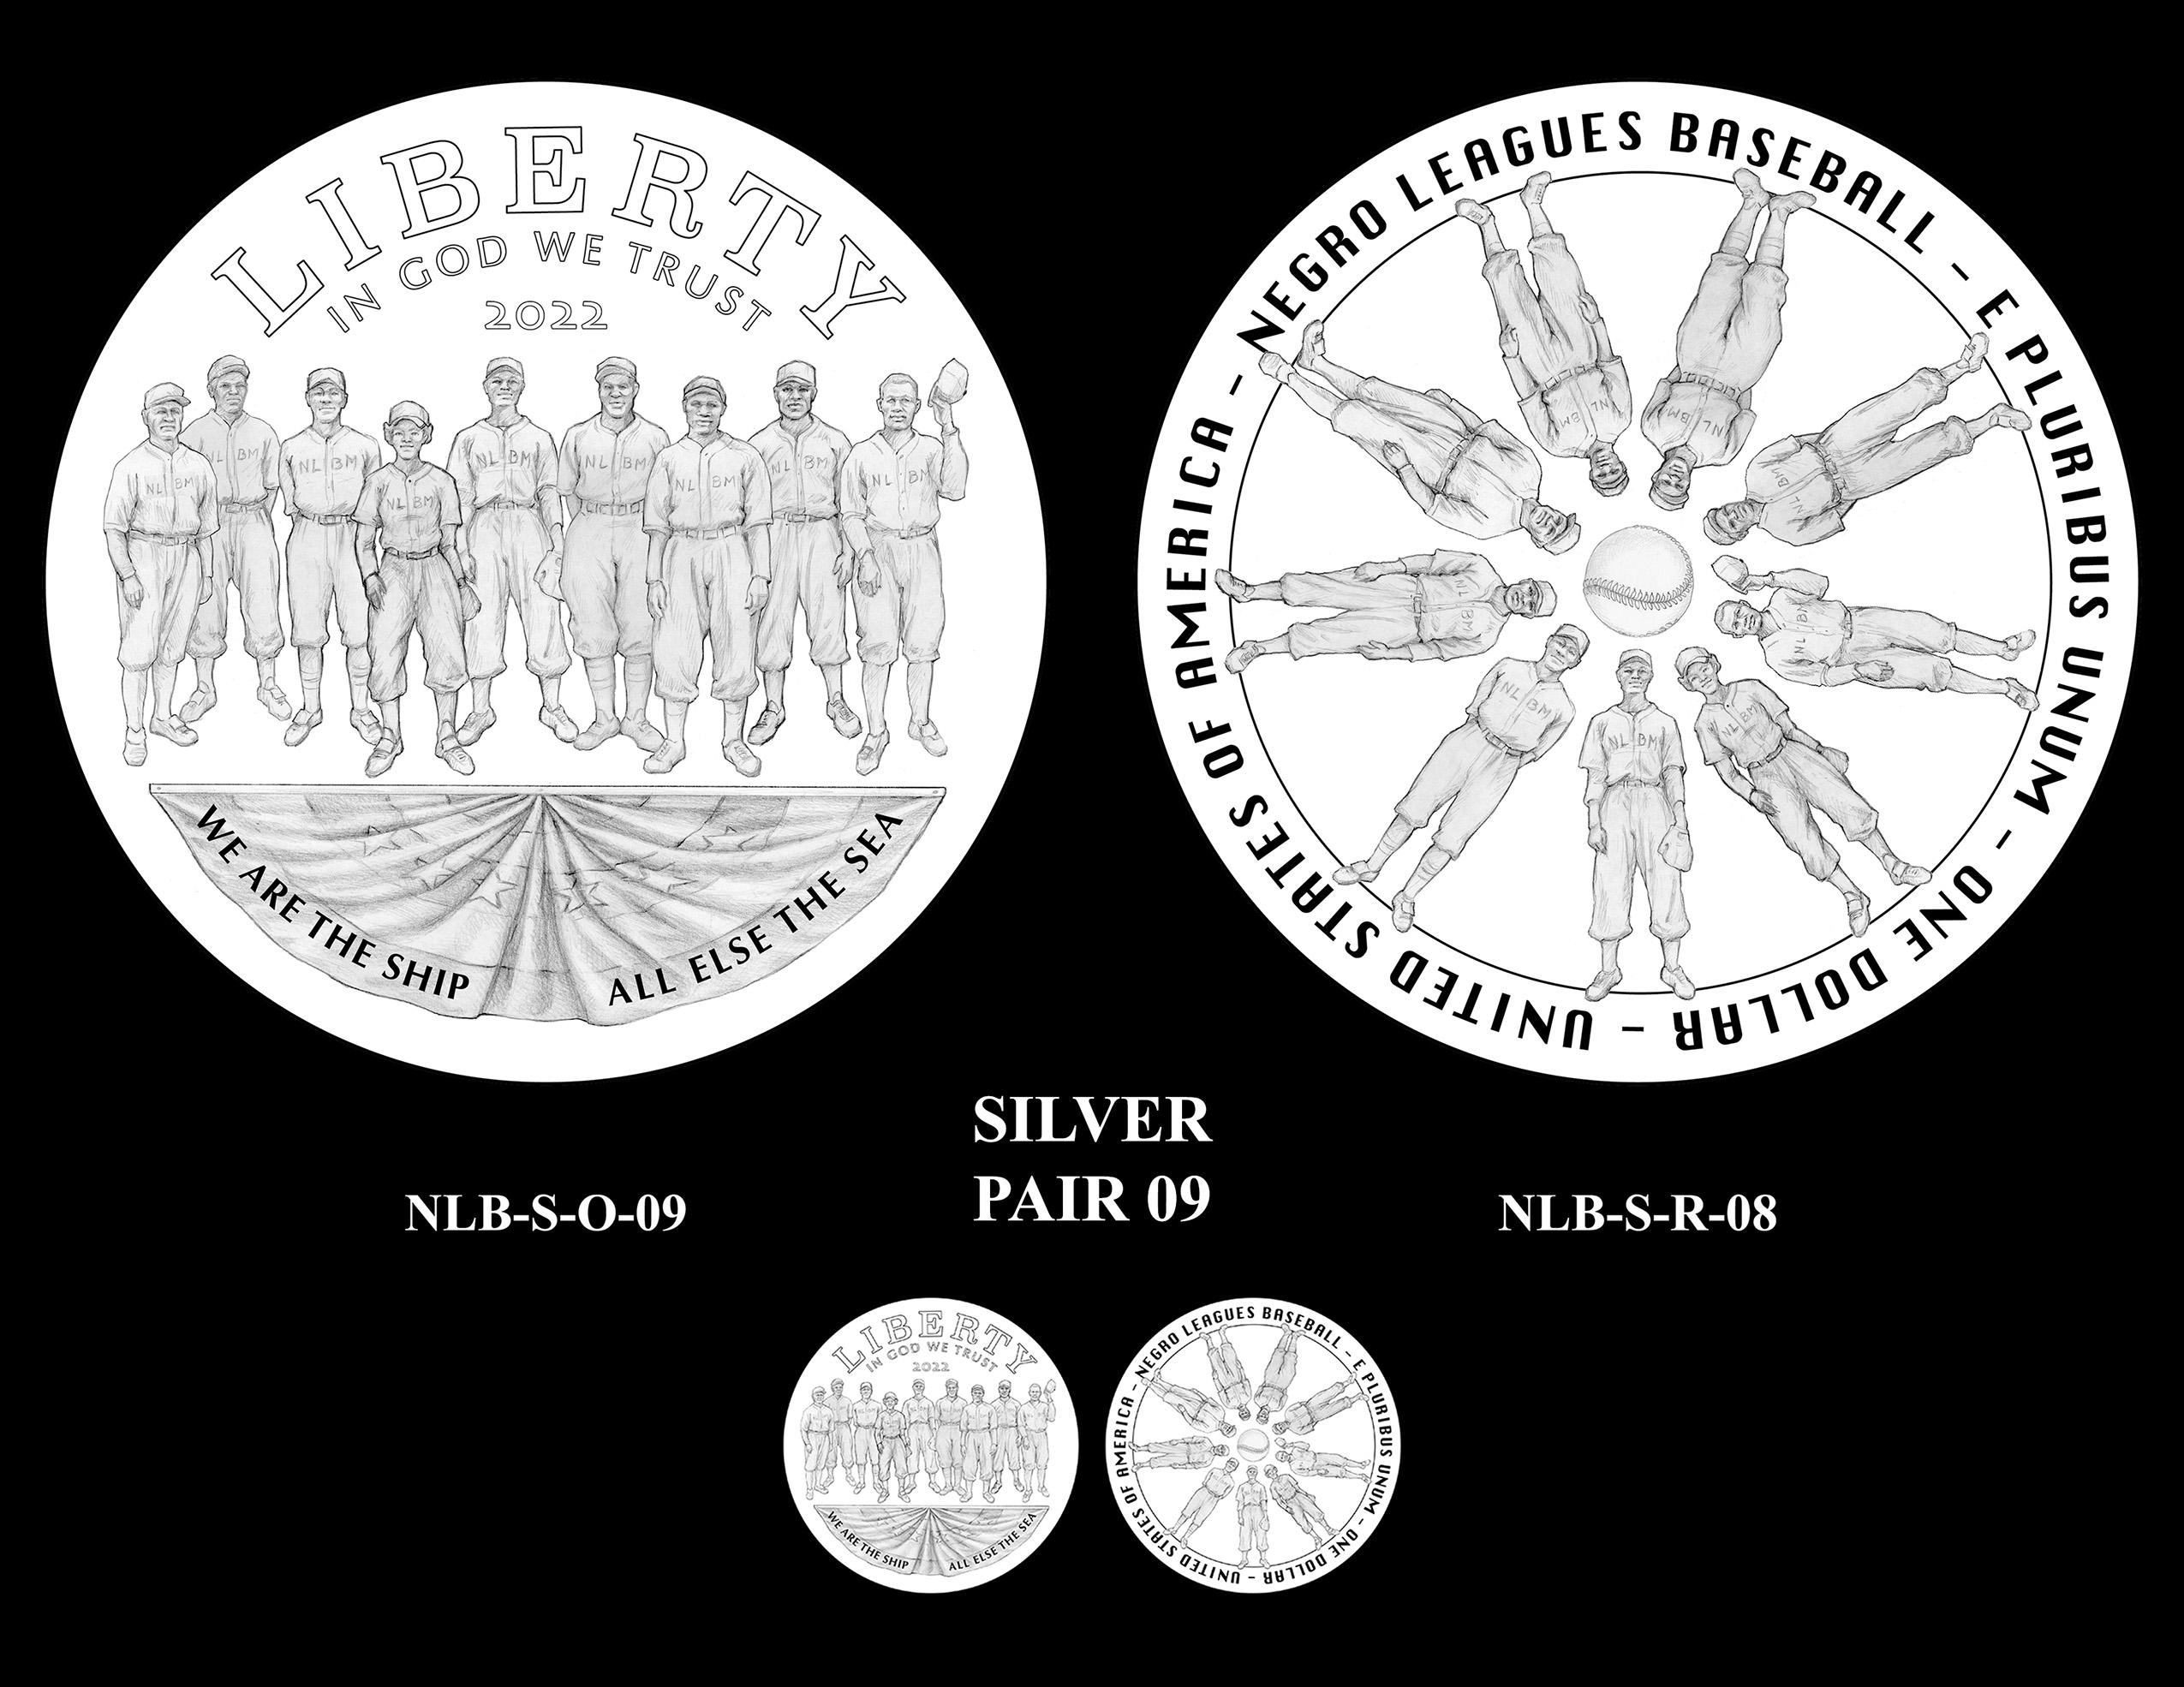 Silver Pair 09 -- Negro Leagues Baseball Commemorative Coin Program